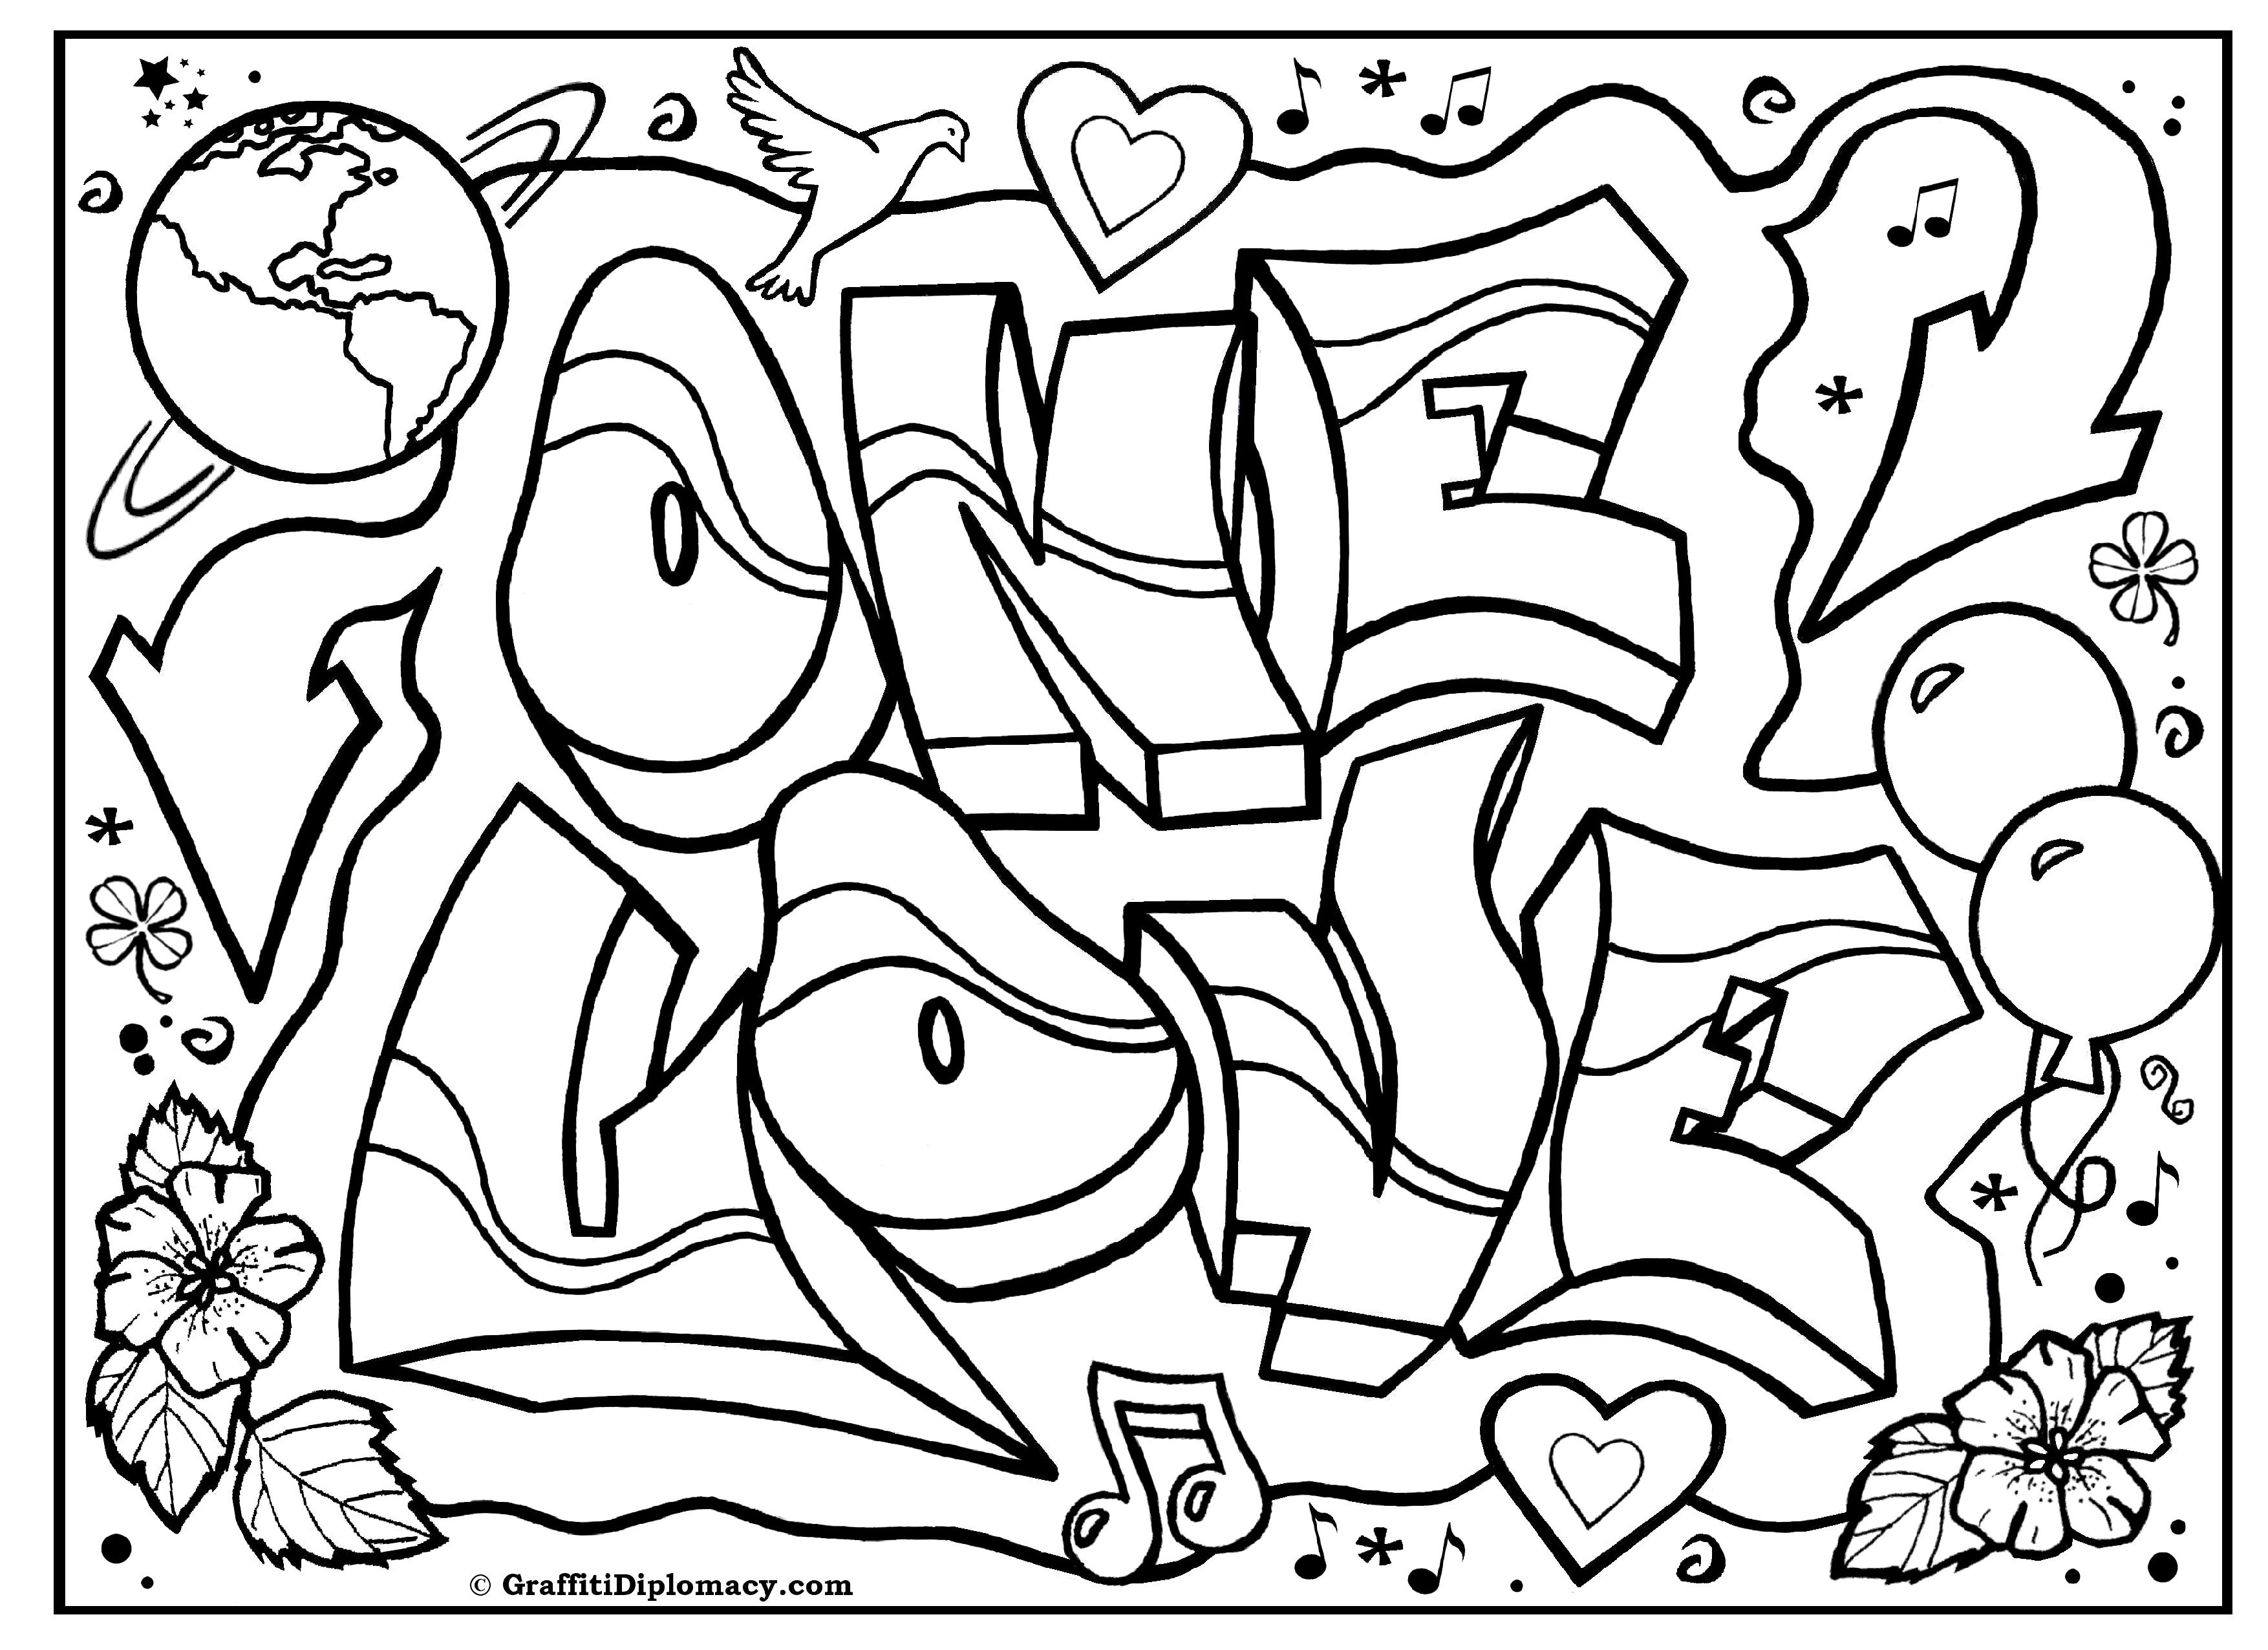 99 genial coole ausmalbilder graffiti fotos  kinder bilder